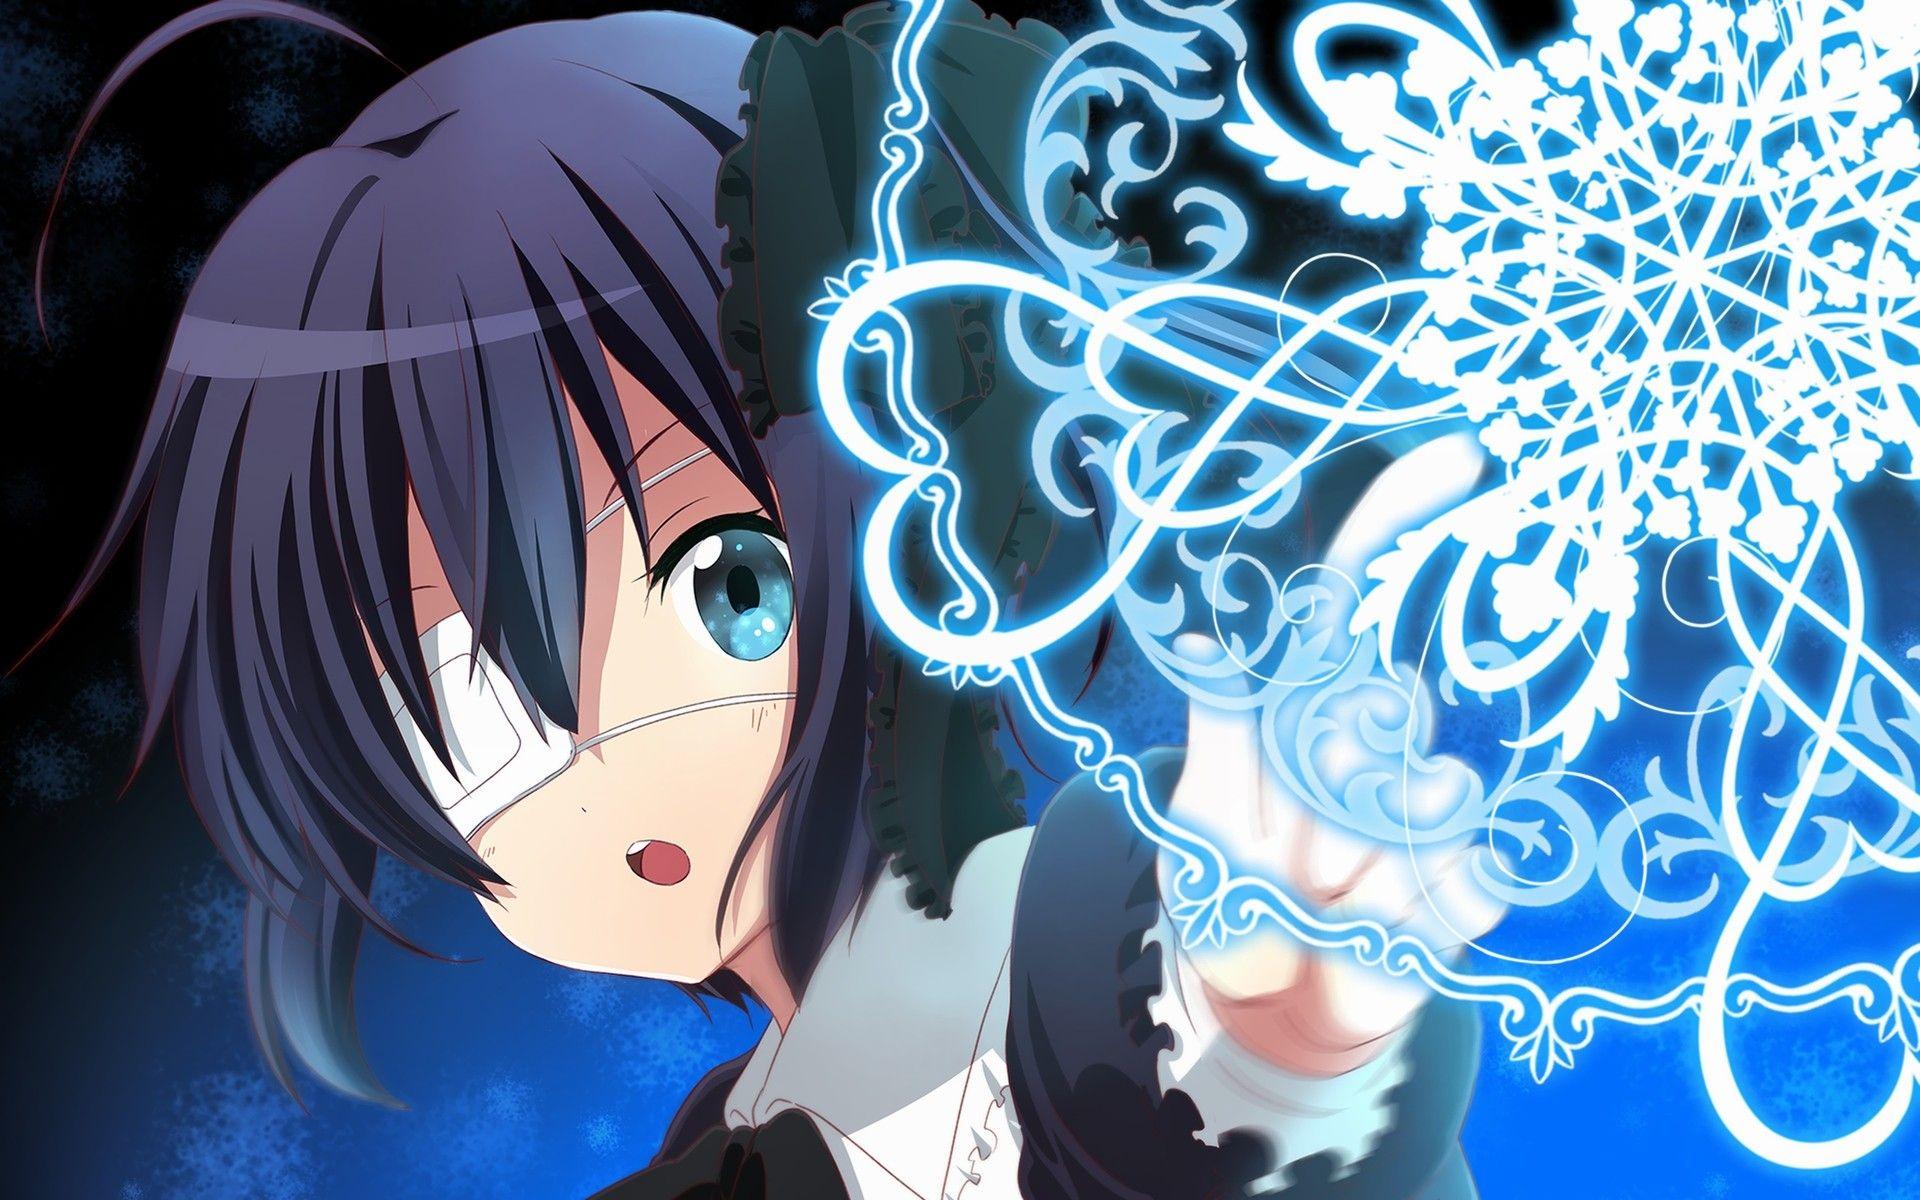 Anime Love, Chunibyo & Other Delusions Rikka Takanashi